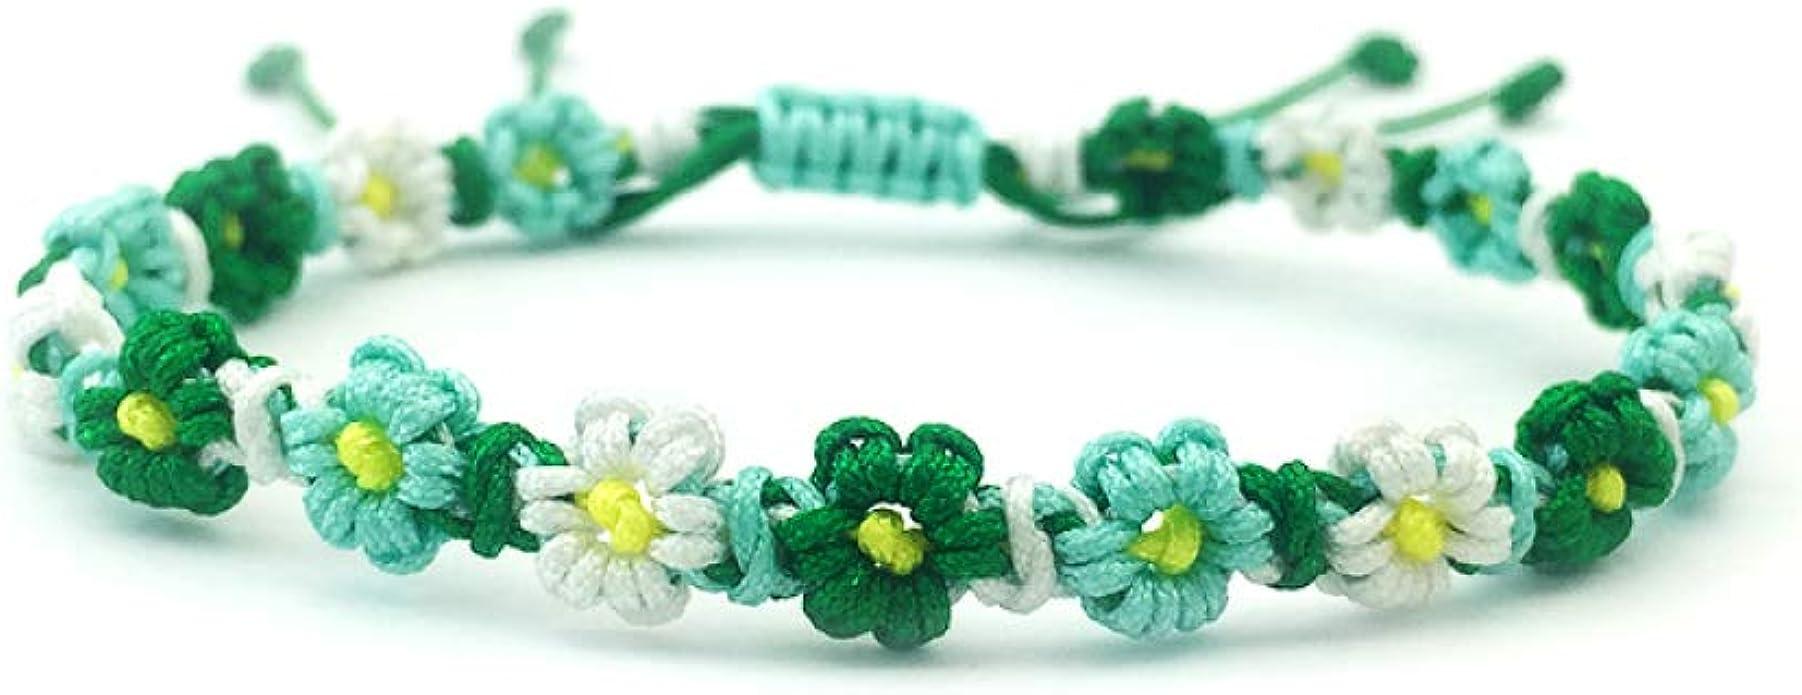 3pcs//Set Bohemian Retro Sunflower Rope Bracelet Women Handmade Woven Jewelry FL